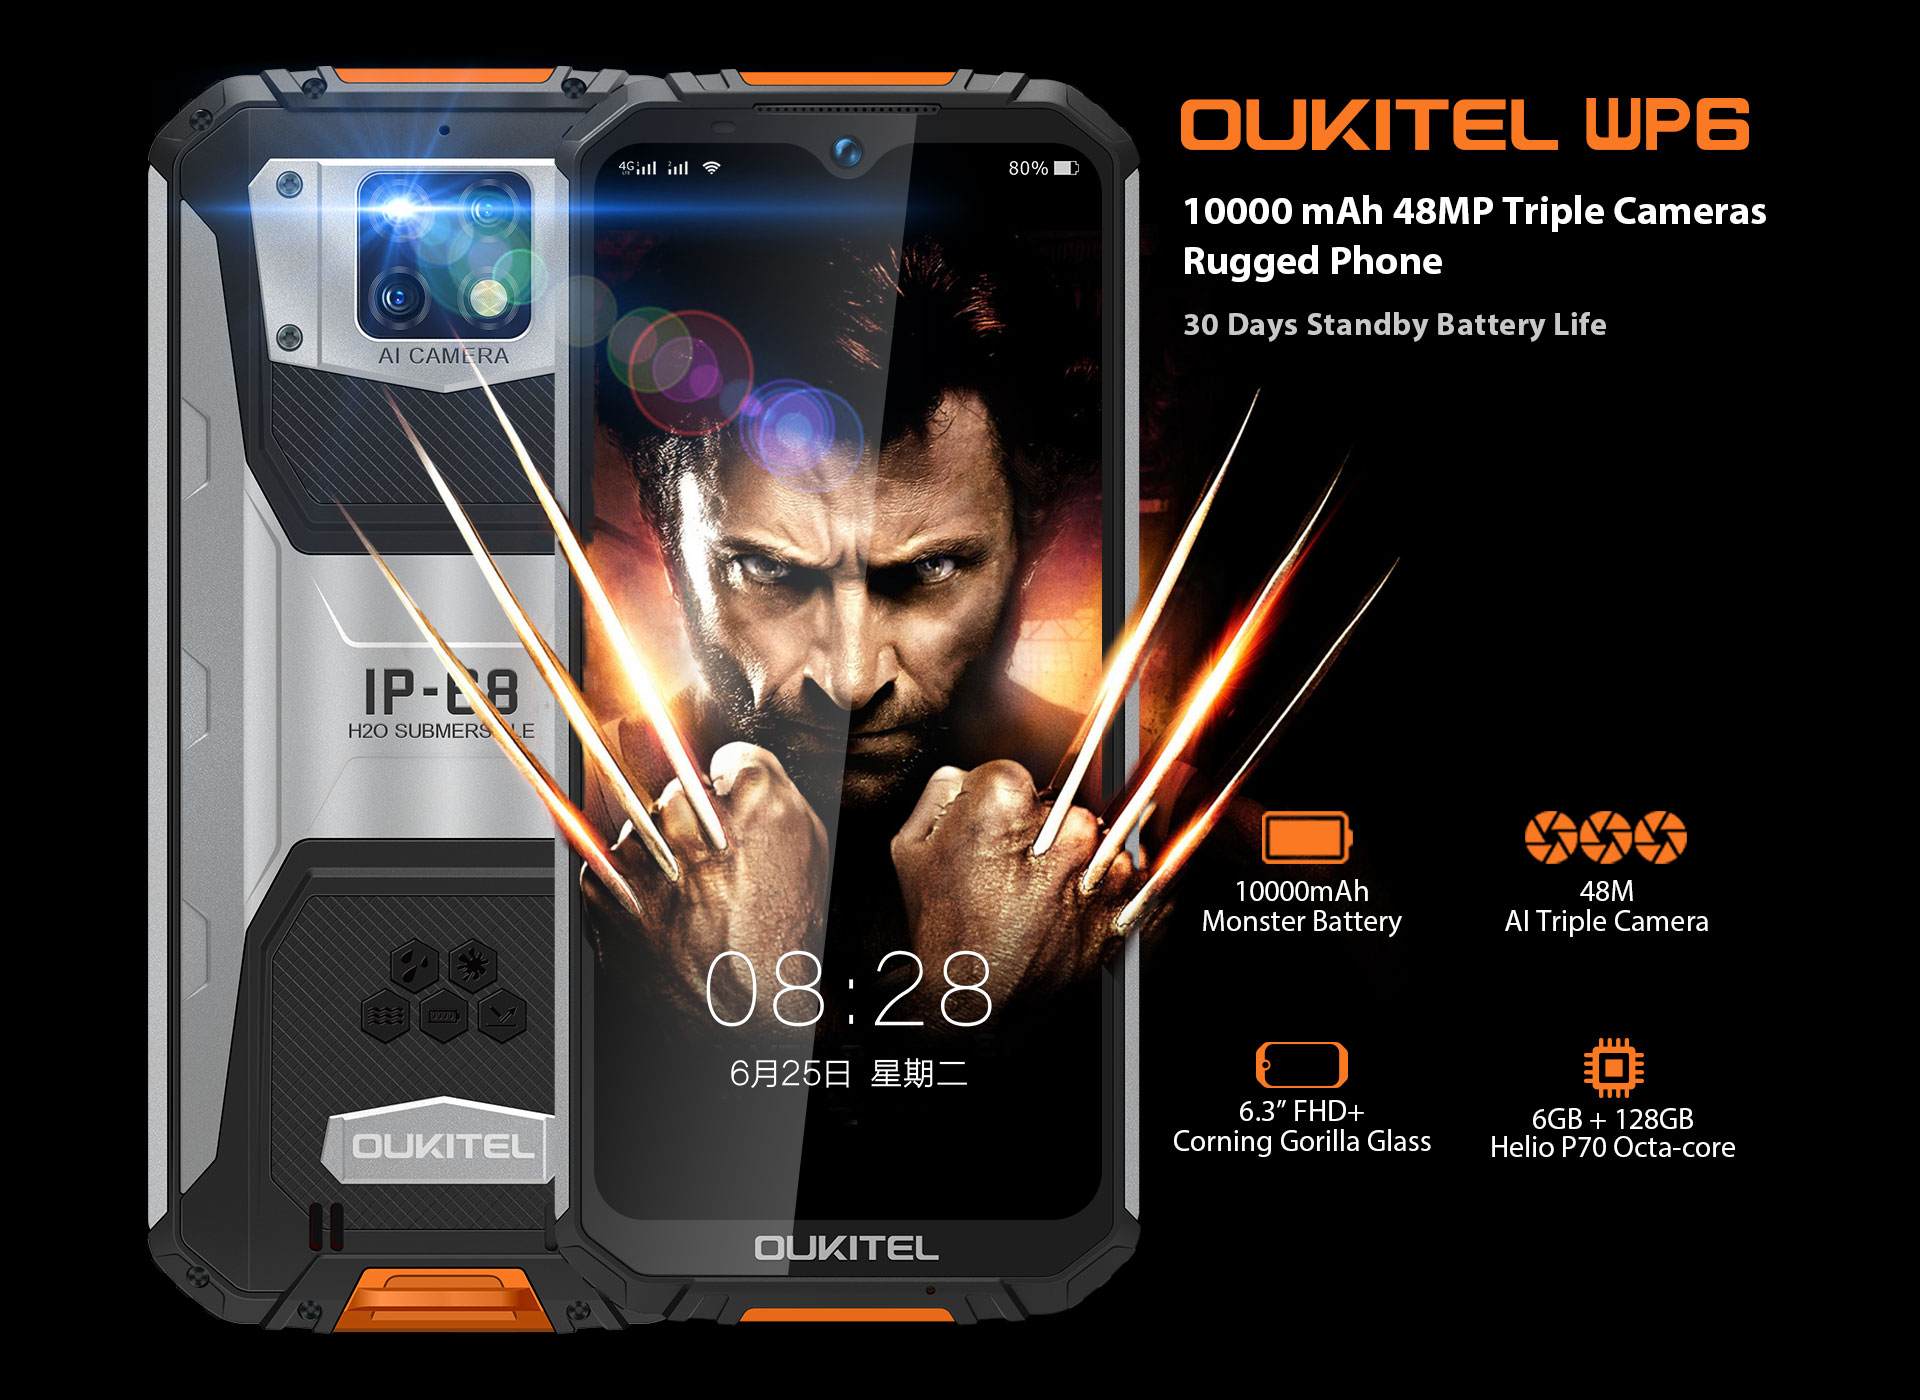 oukitel-wp6.jpg